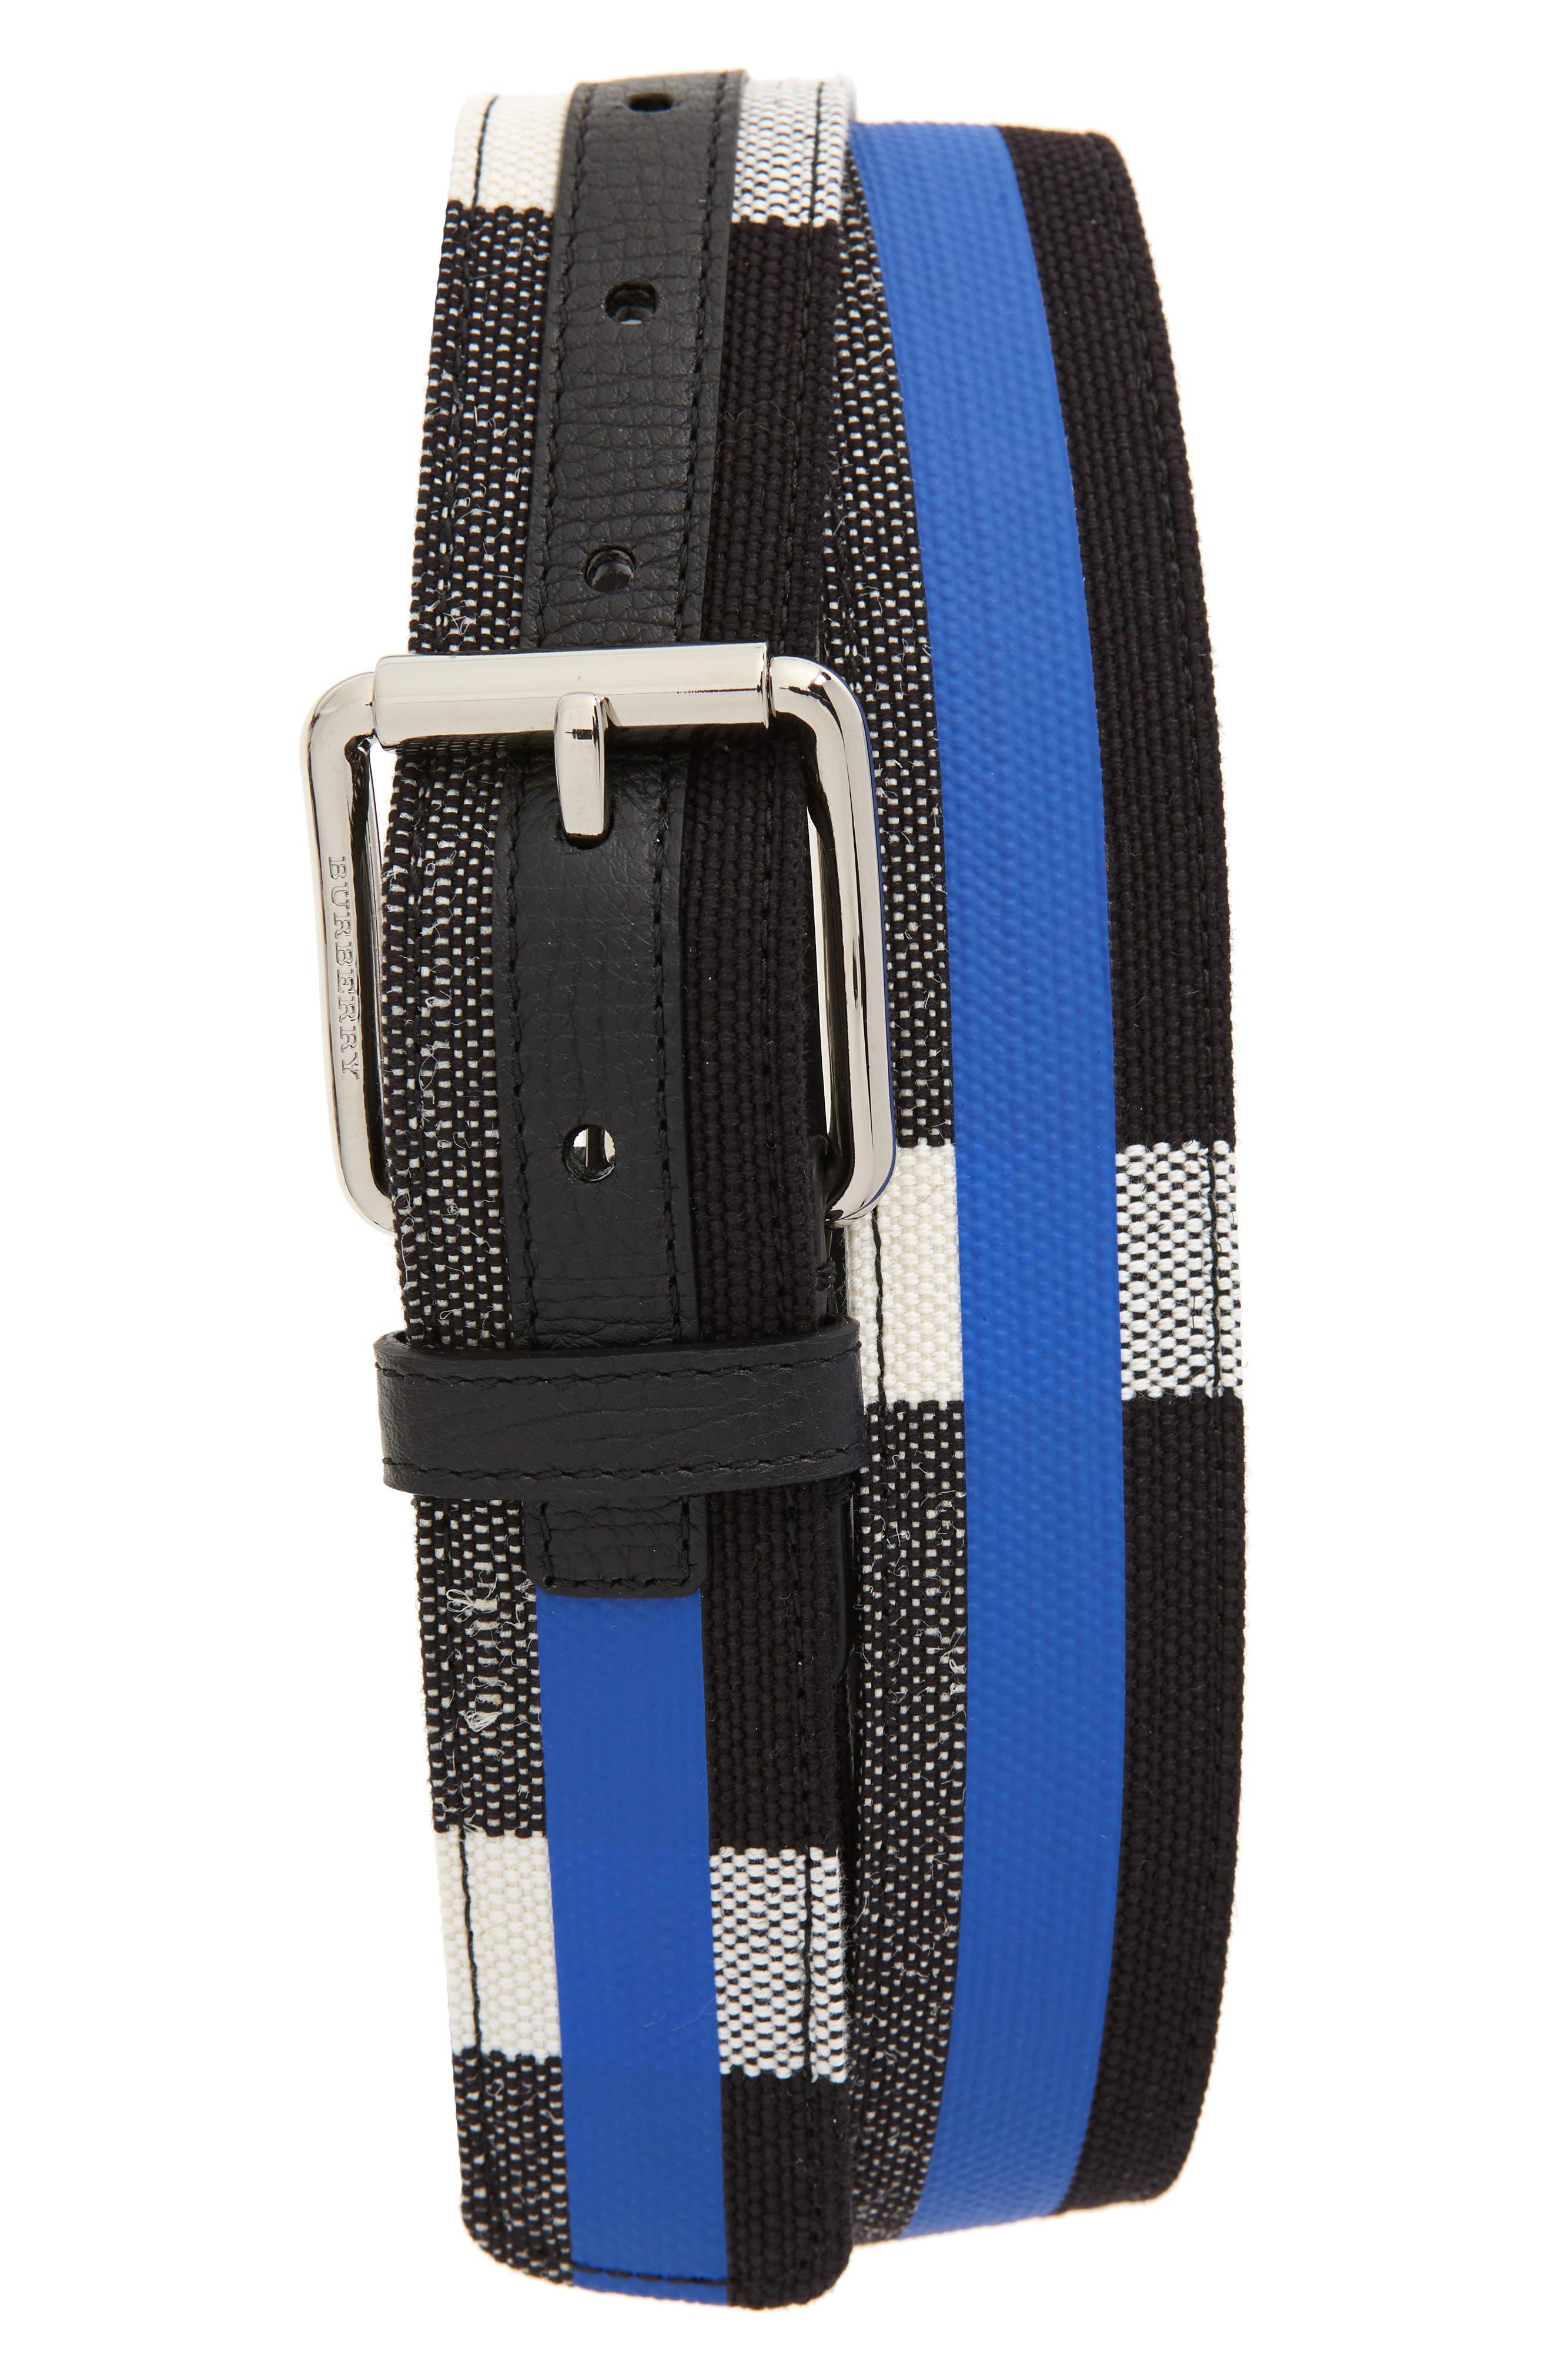 Roller Buckle Woven Belt,                         Main,                         color, Blueberry/ Black